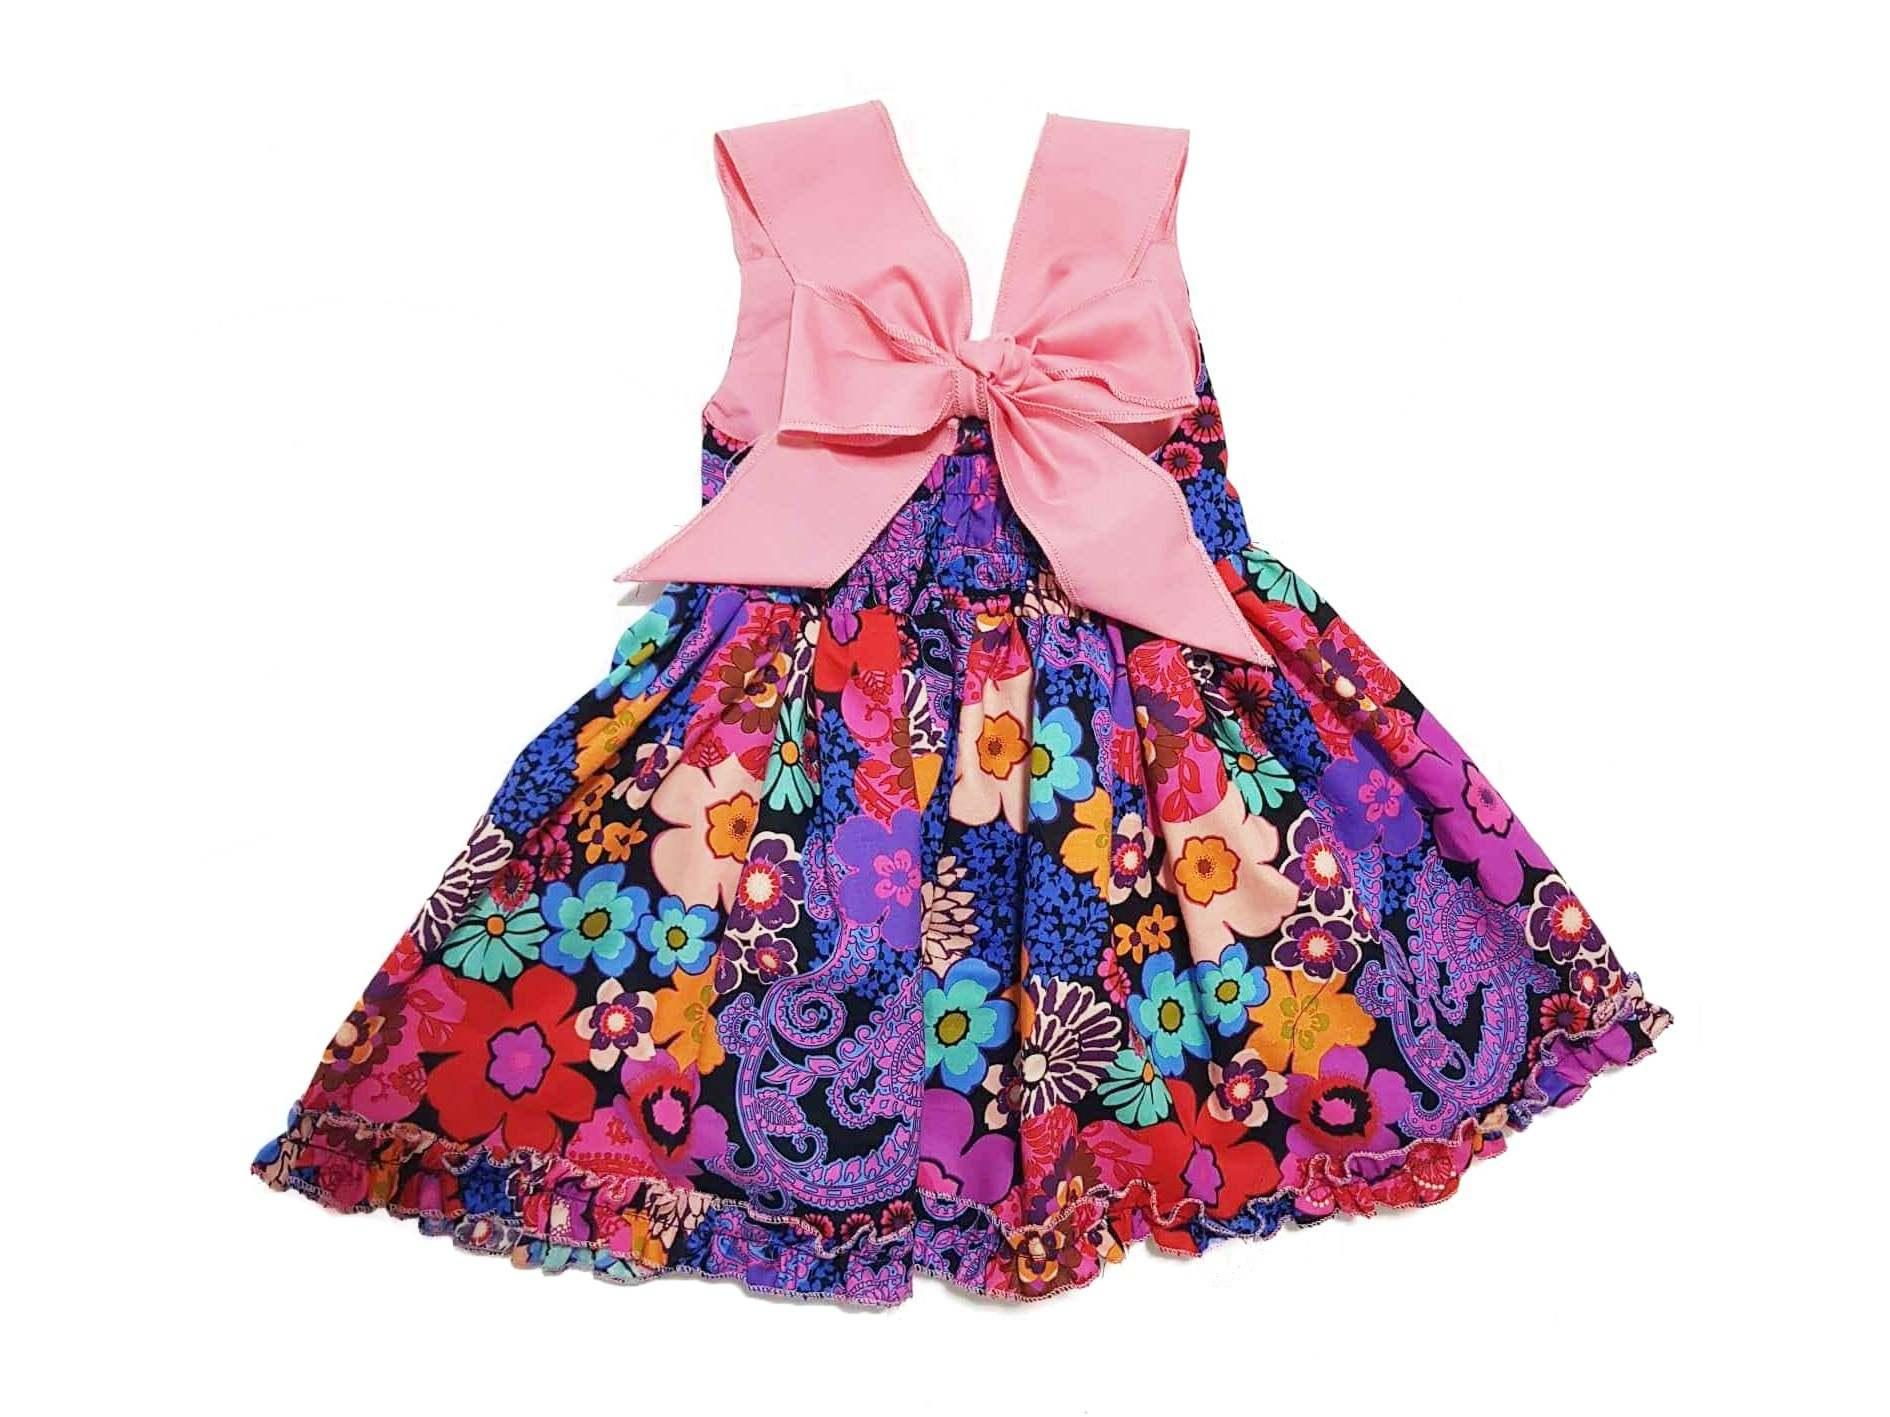 Girls Dresses For Sale Baby Dresses For Girls Online Brands